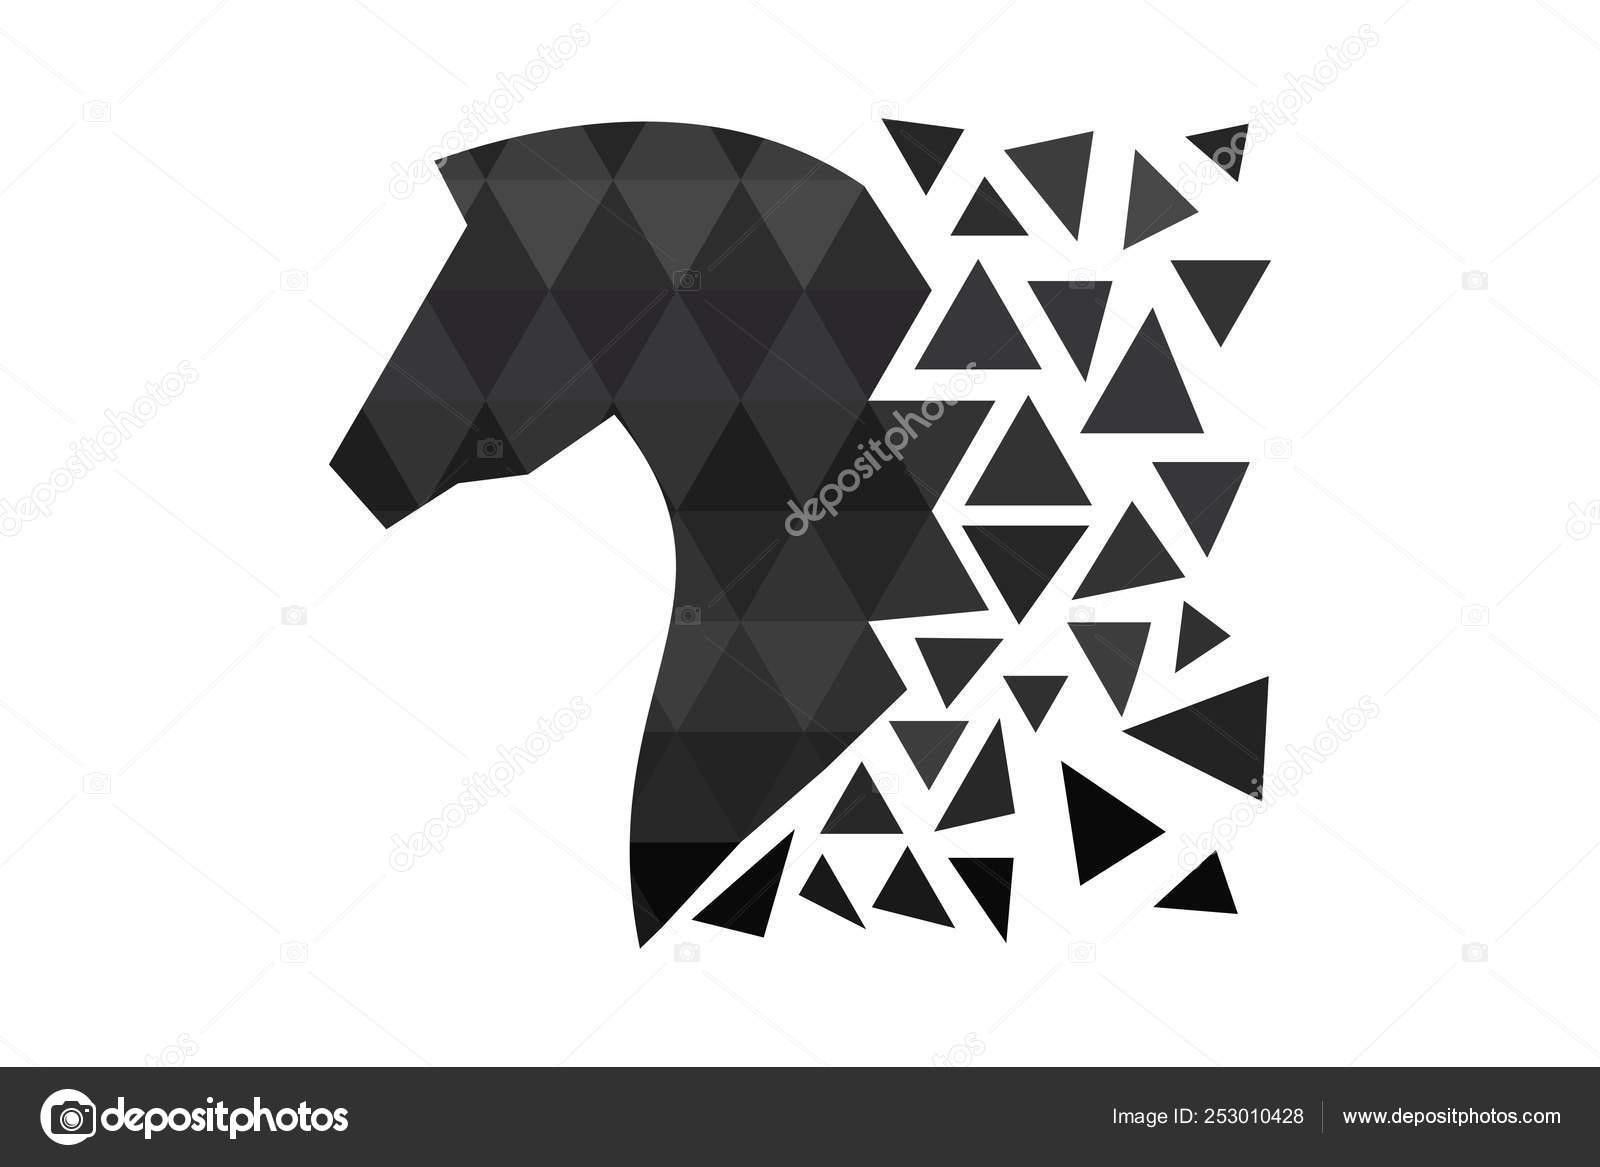 Dark Horse Silhouette Polygons Triangle Design Animal Polygons Horse Head Stock Vector C Art Food 253010428